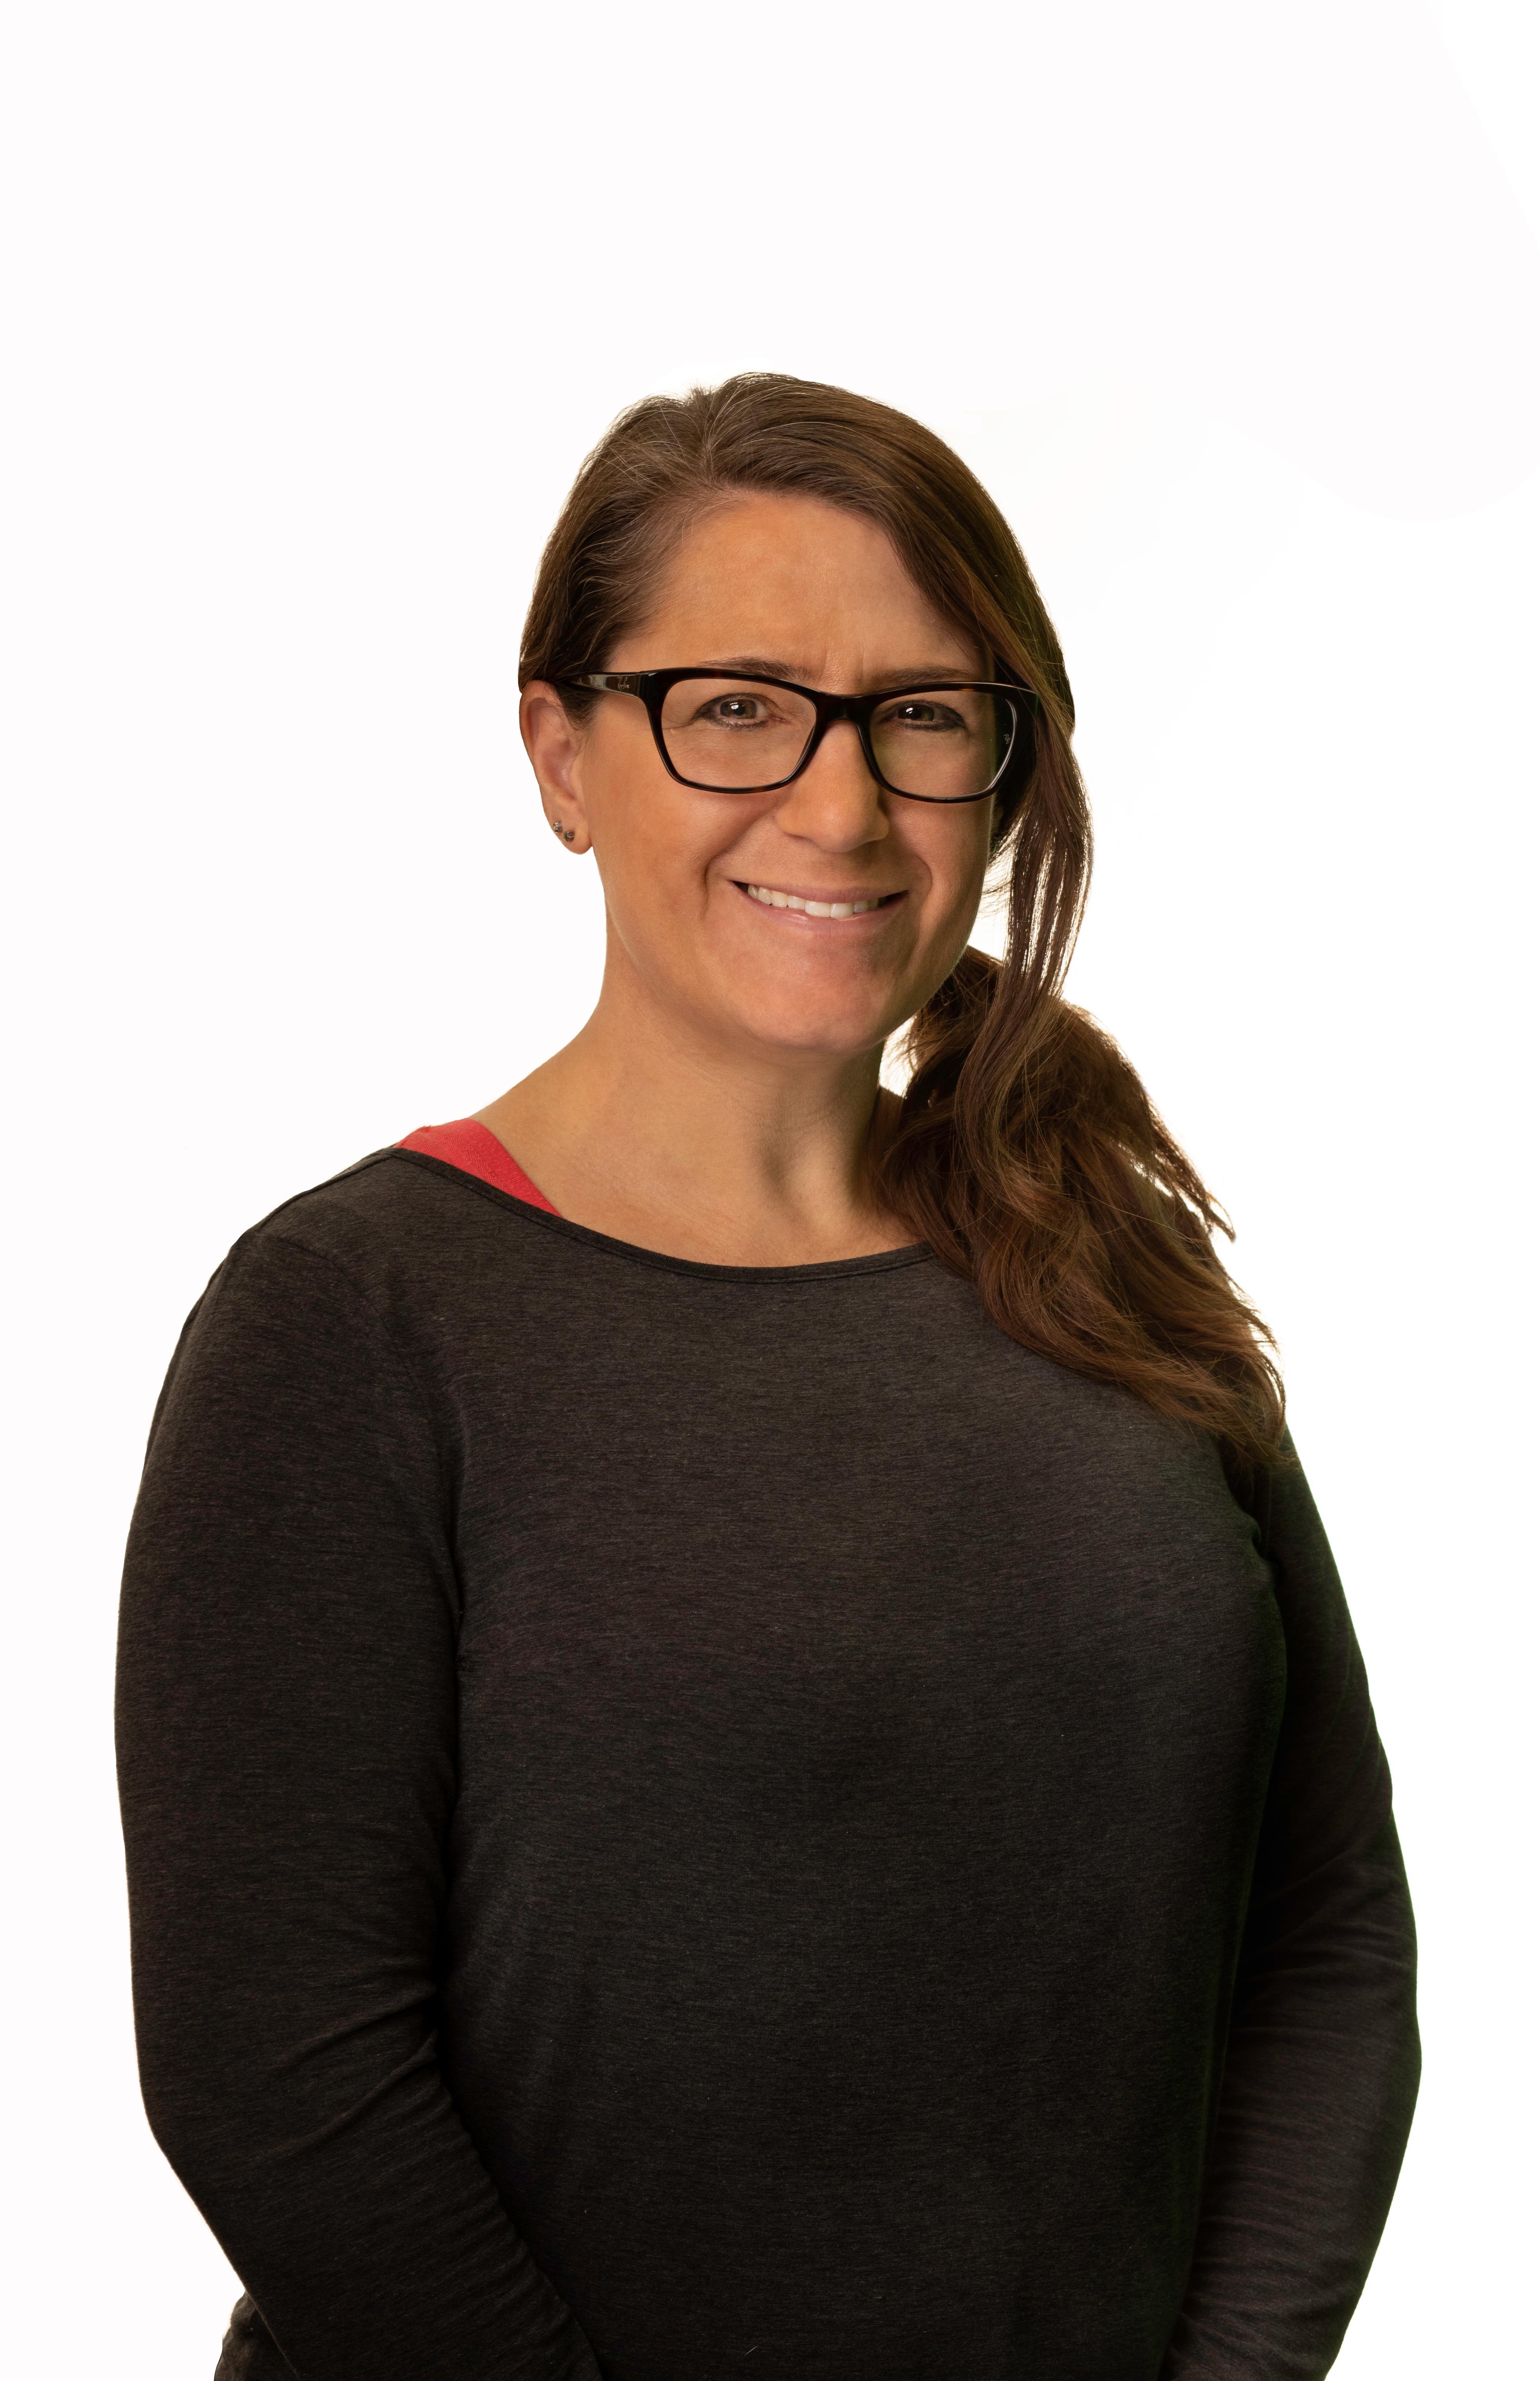 Erin Greenwood Portrait Photo